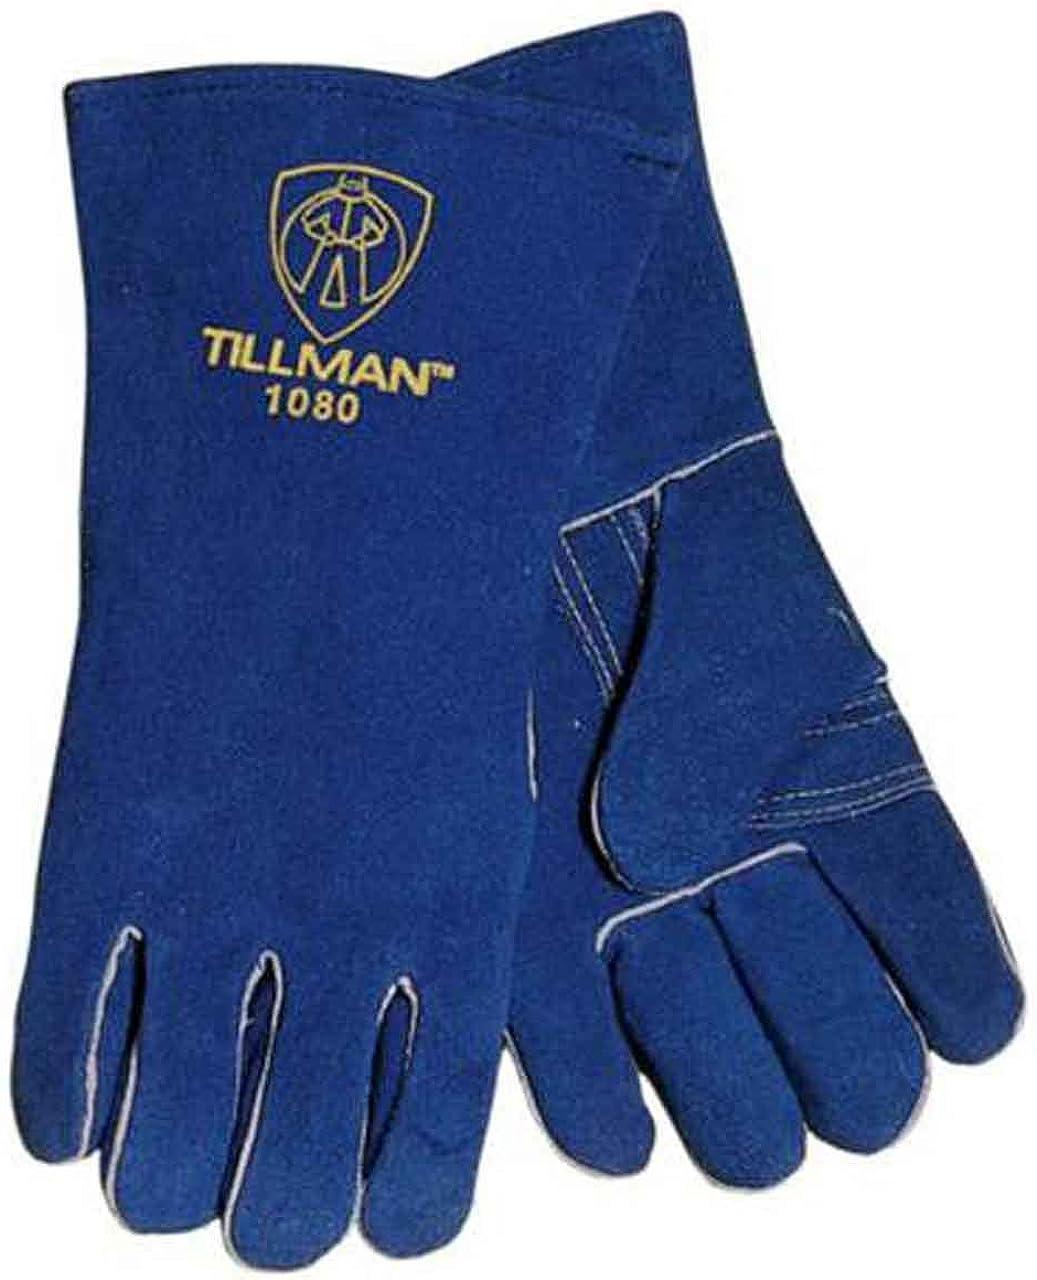 Ranking TOP7 Tillman 1080 Premium Side Split Manufacturer regenerated product Large Gloves - Welding Cowhide